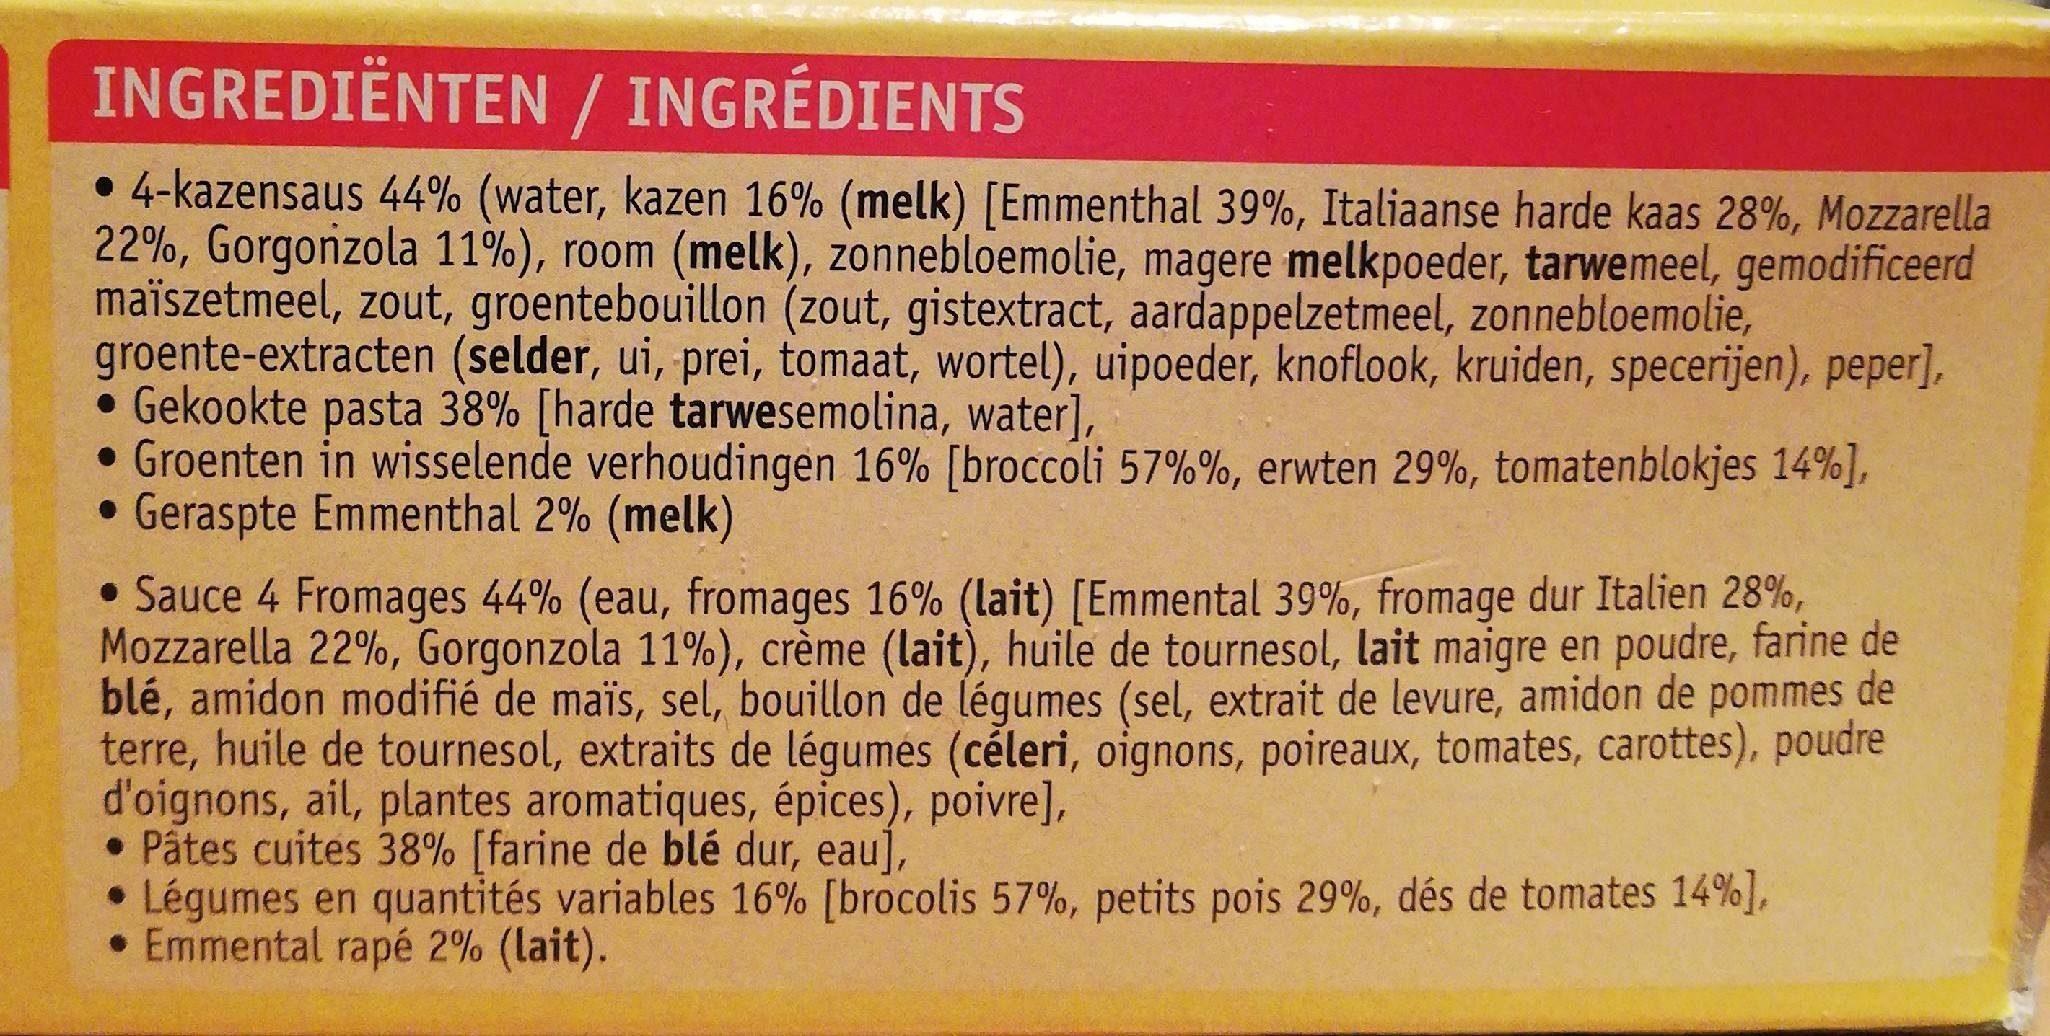 Penne 4 fromages au petit légumes - Ingrediënten - en